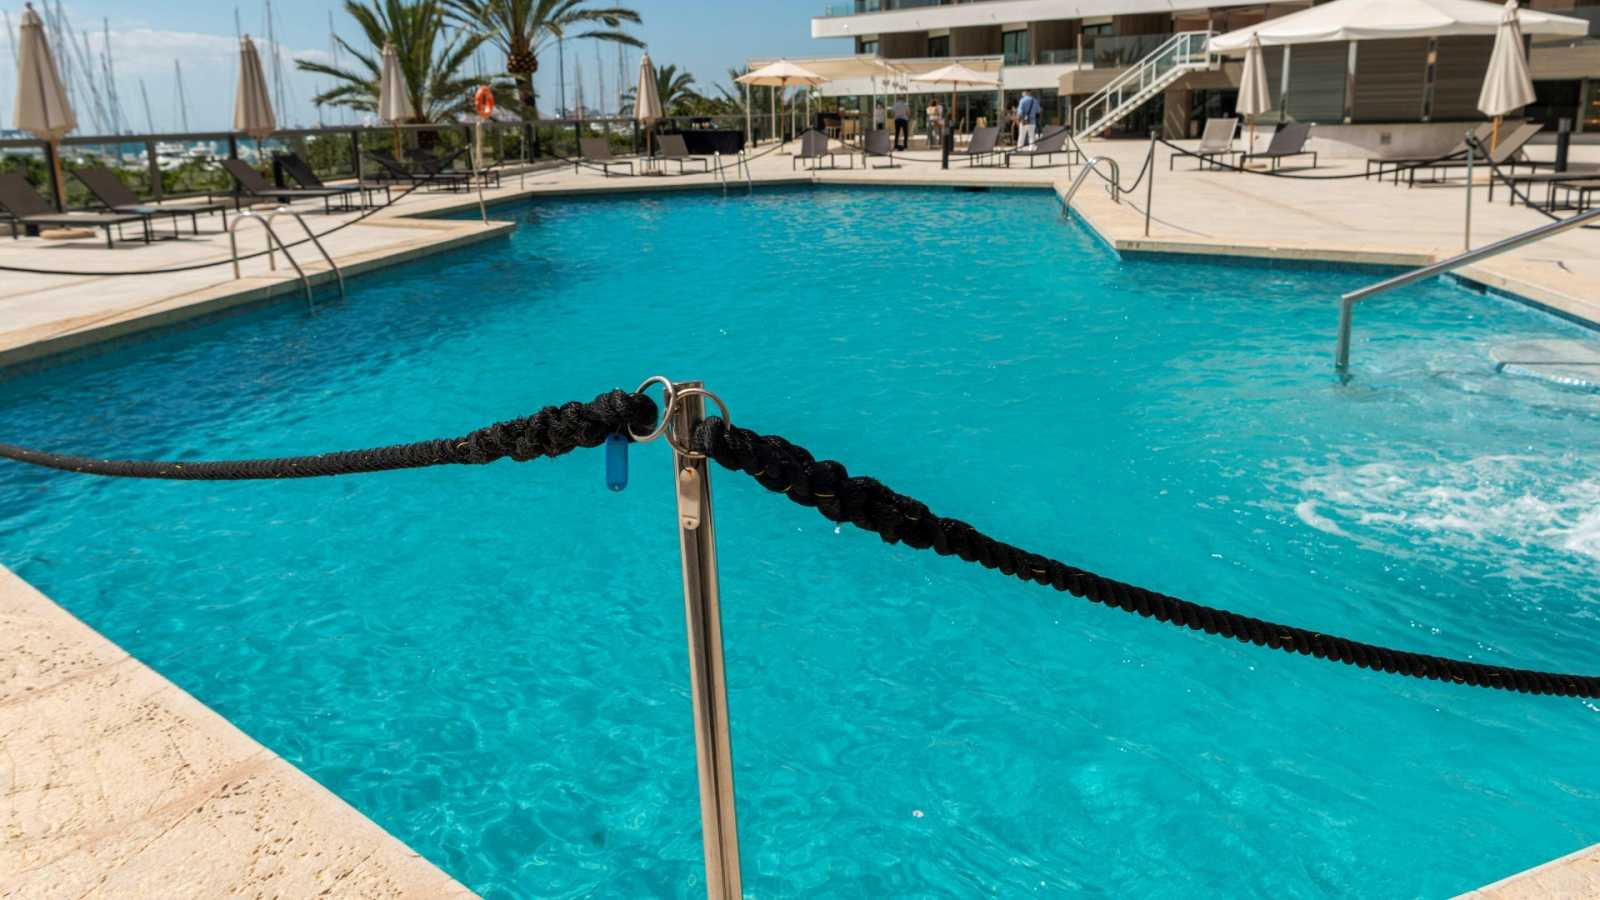 Las piscinas reabrirán para uso deportivo a partir de este lunes en toda España.